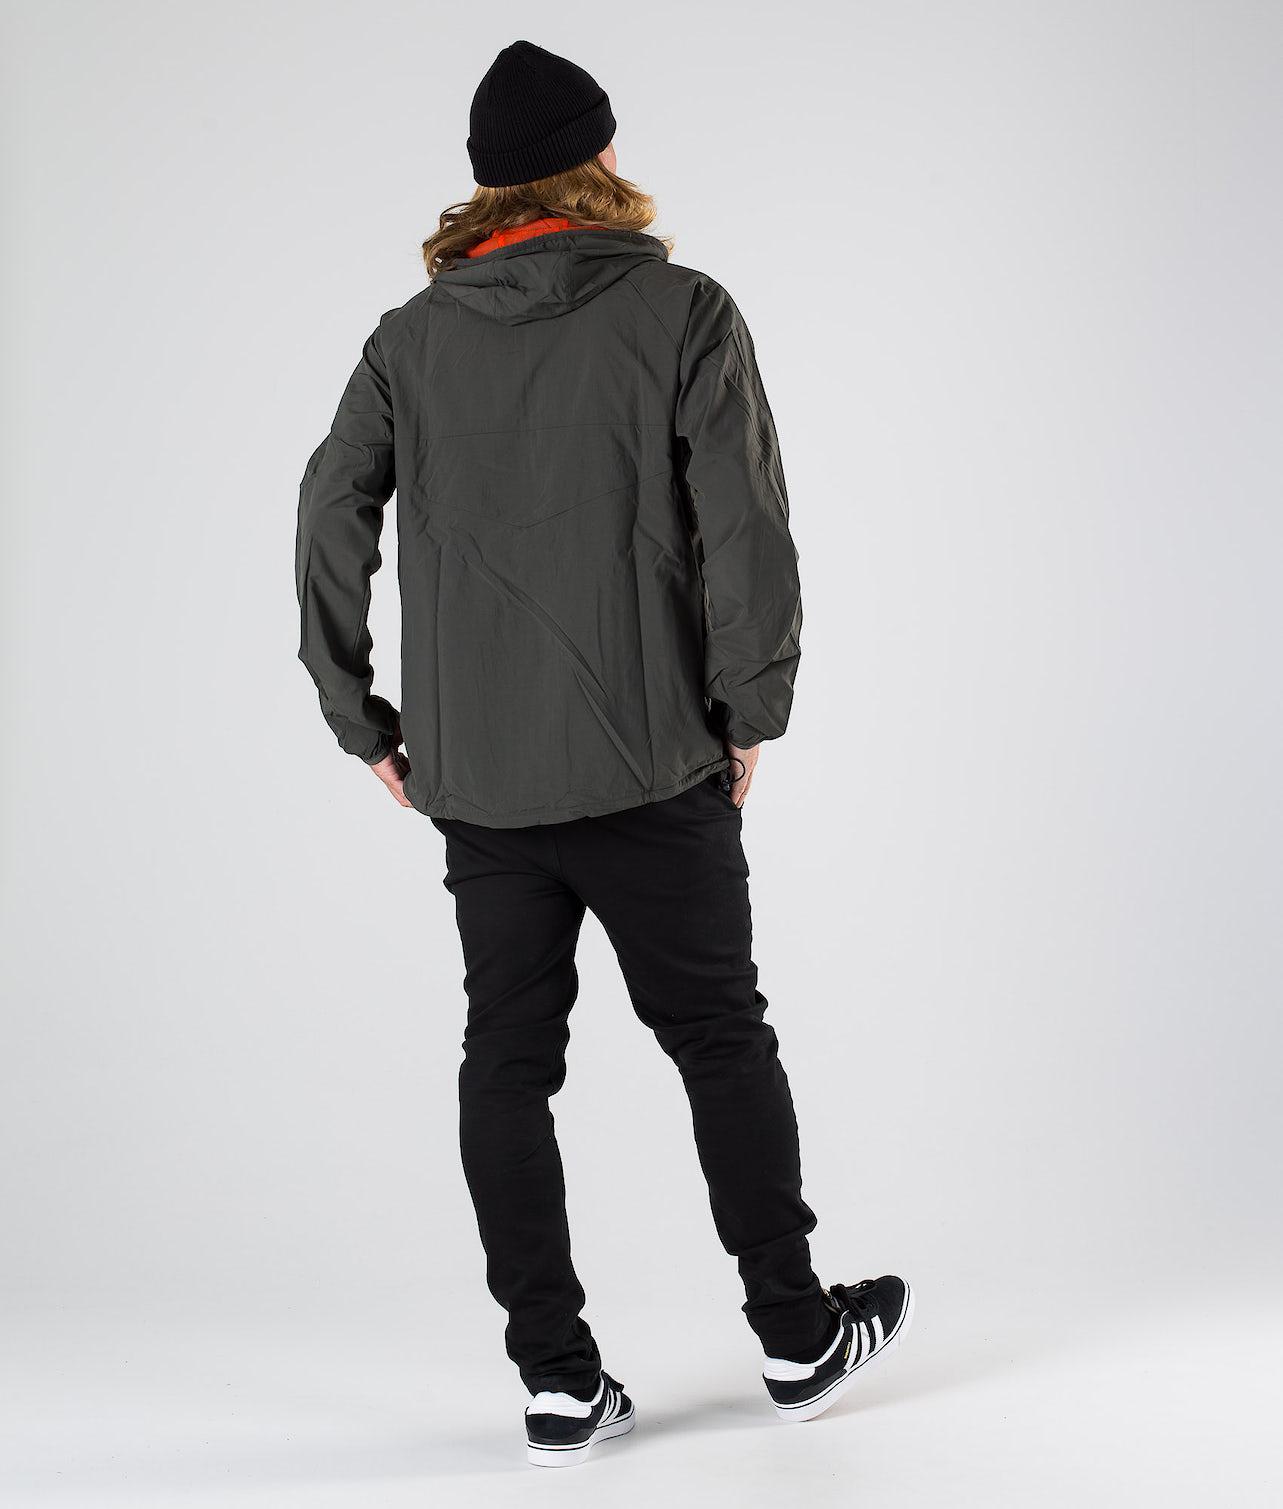 Adidas Skateboarding Dekum Packable Wind Jakke Legend Earth/Active Orange